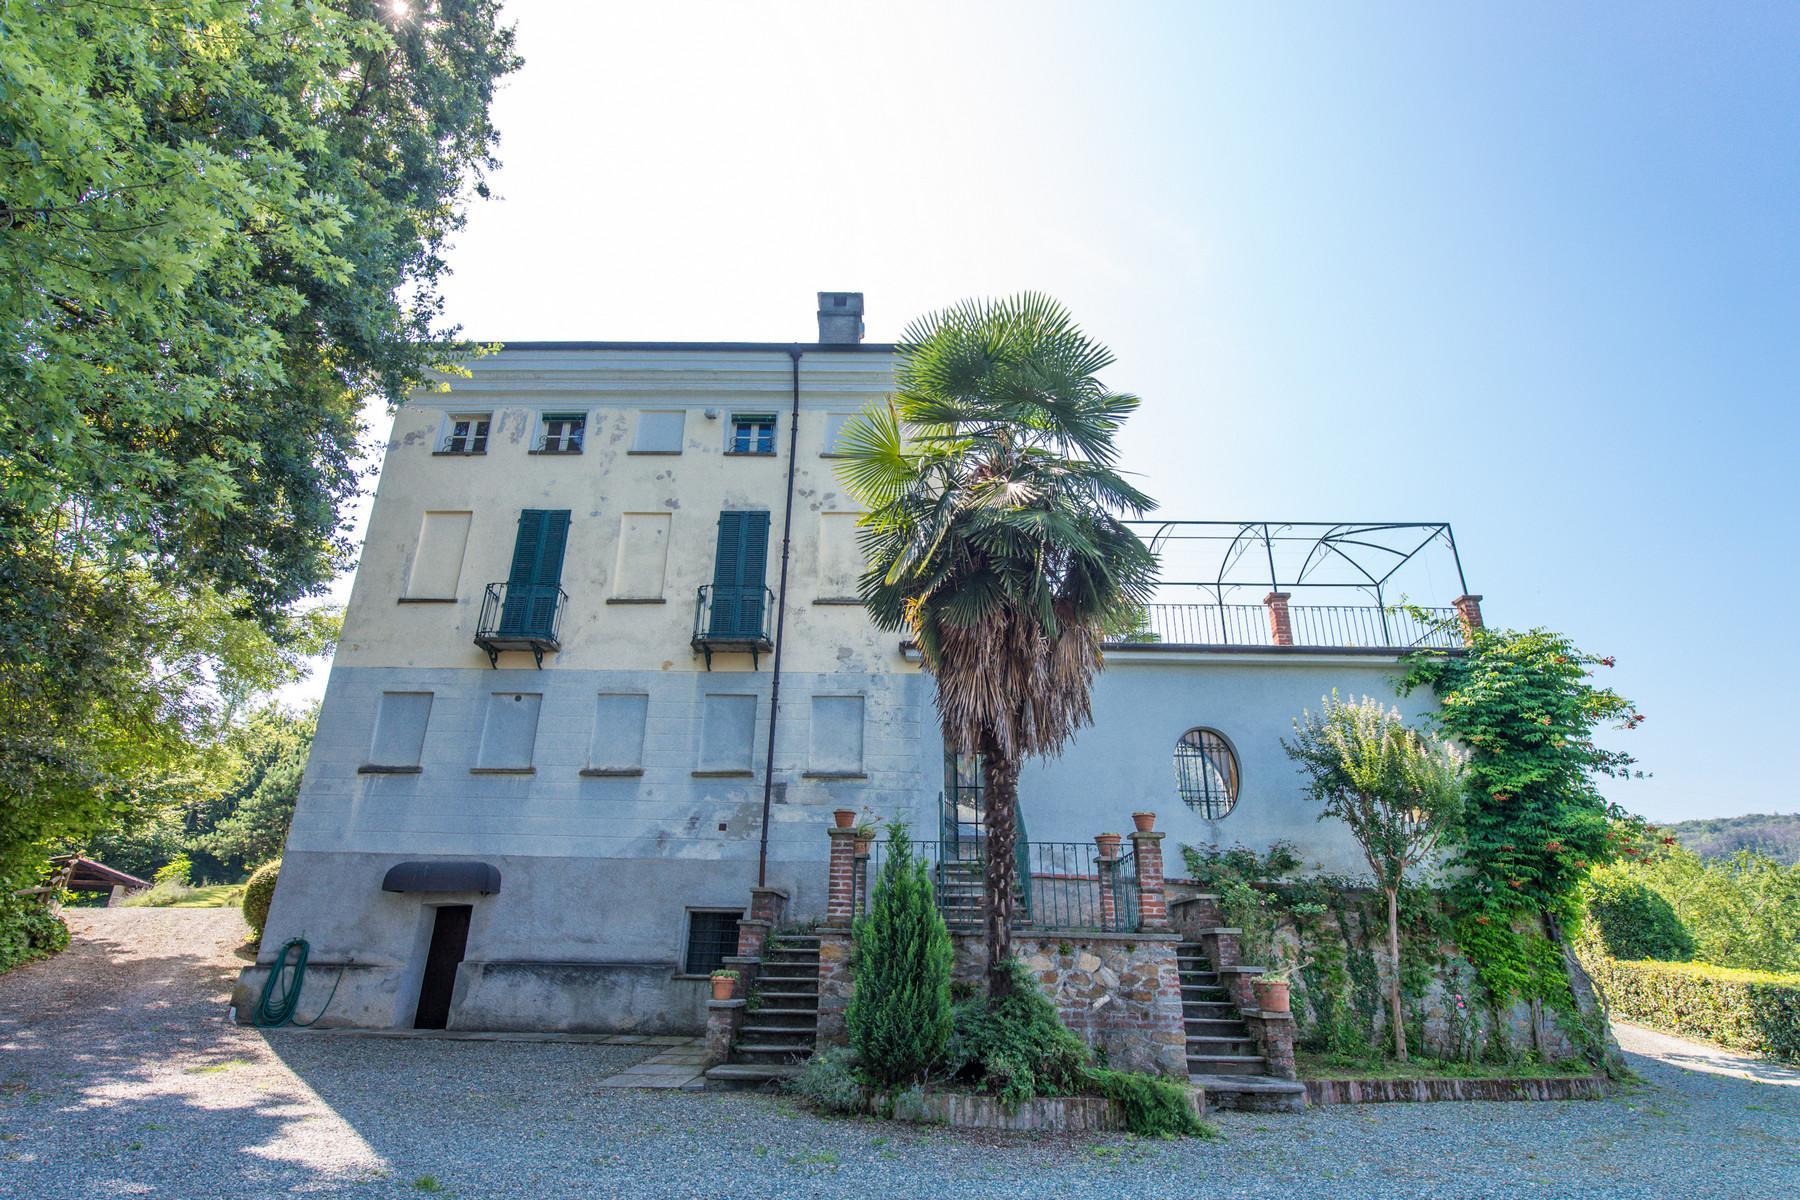 Splendid villa with winery in Piedmont - 20